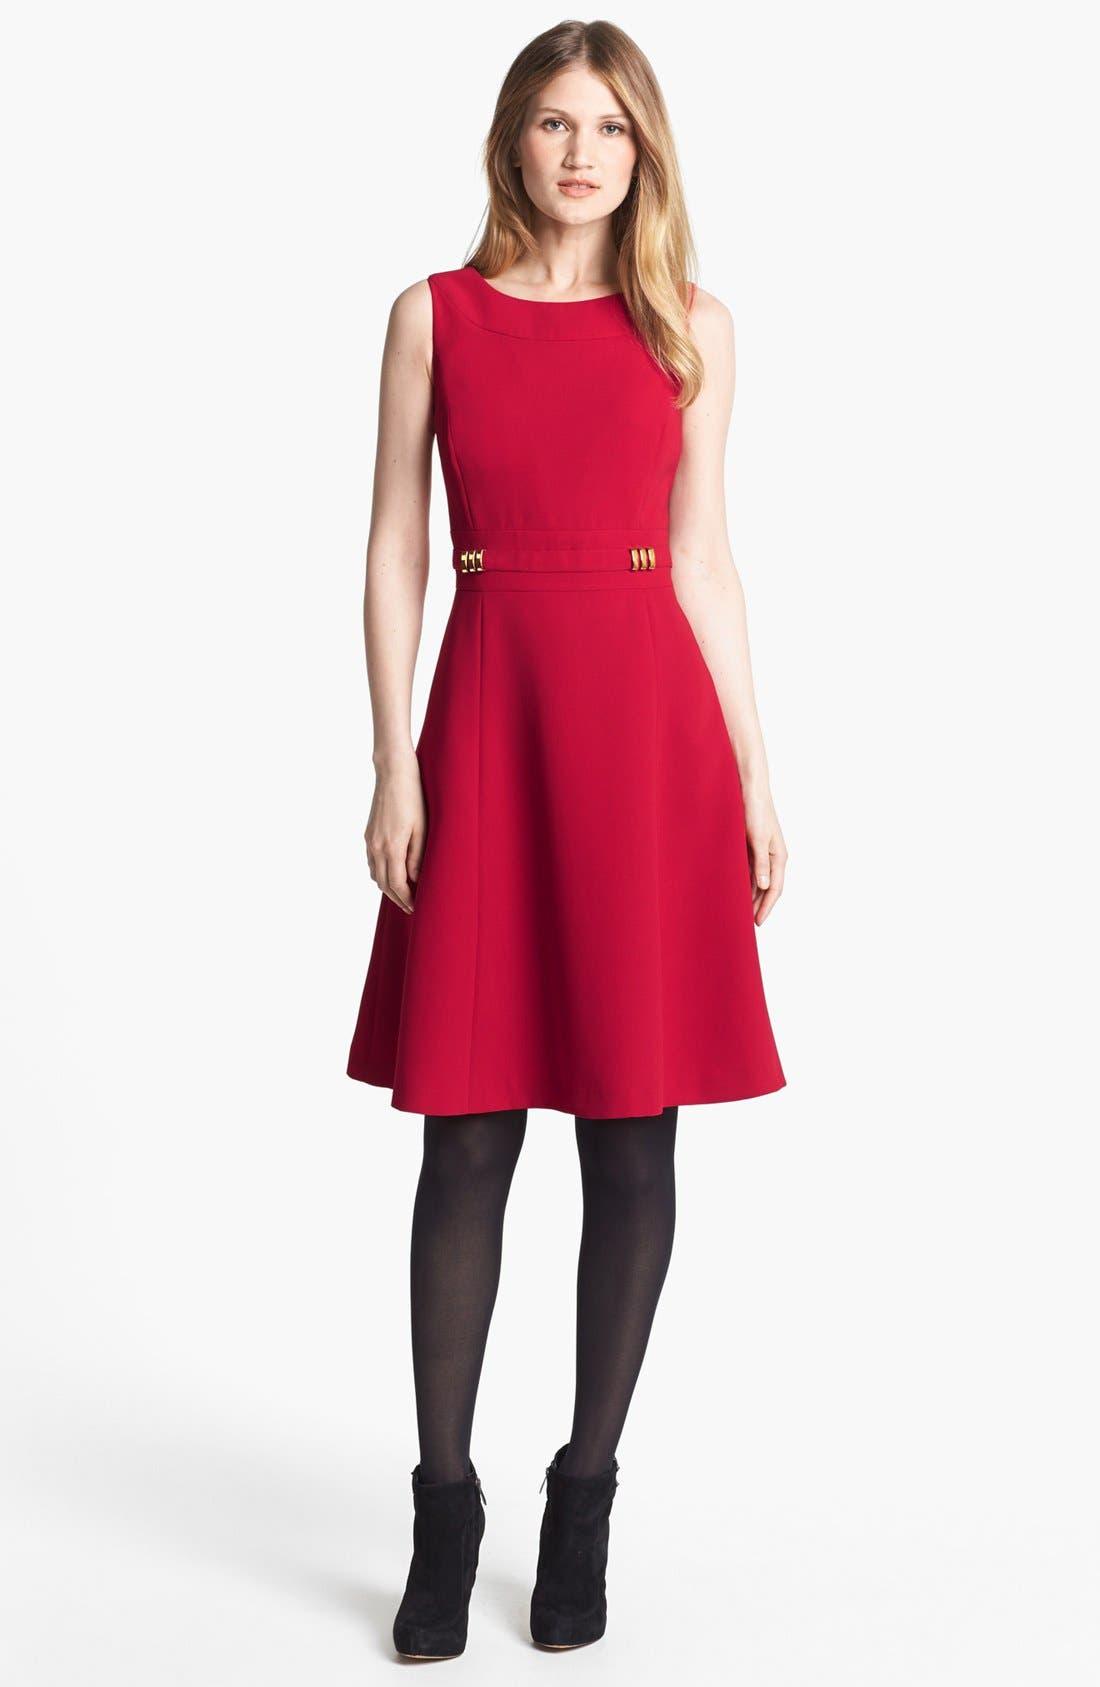 Alternate Image 1 Selected - Tahari Fit & Flare Dress  (Regular & Petite) (Regular Sizes Online Only)